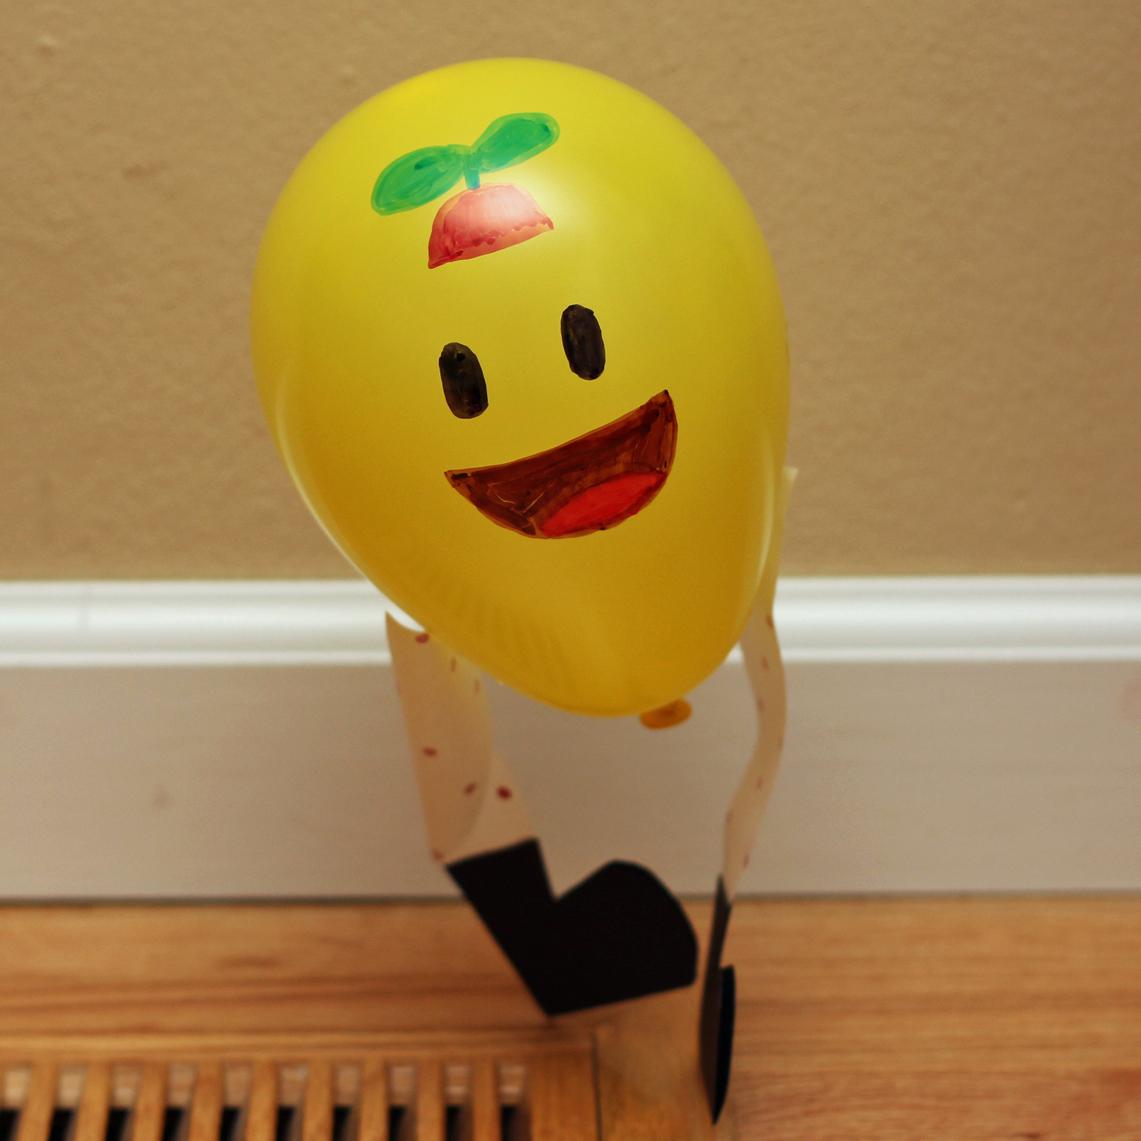 Mr. Dancing Balloon